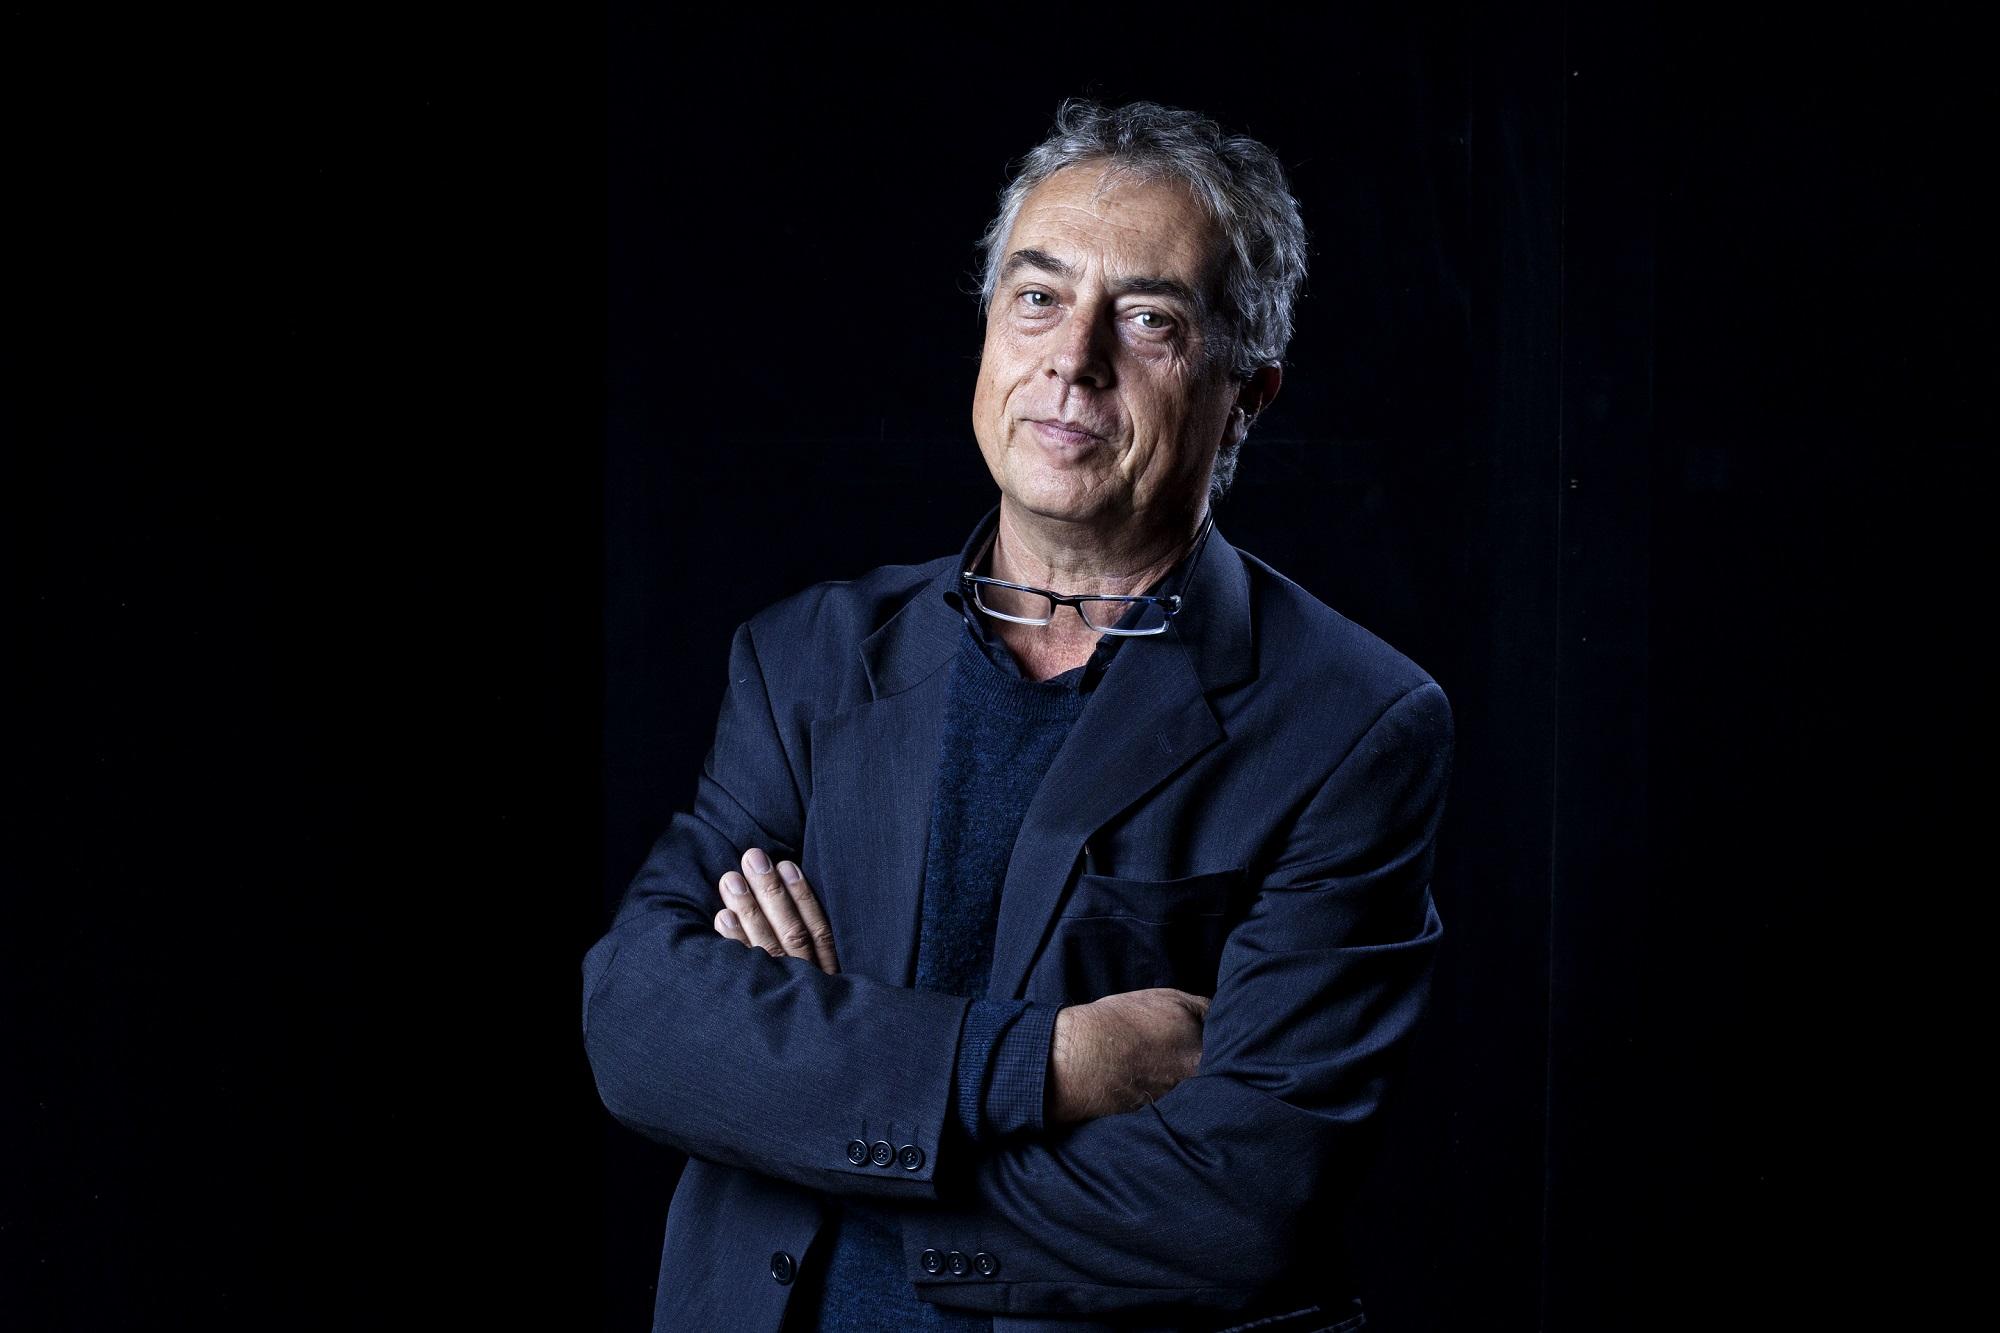 Stefano Boeri sfondo nero